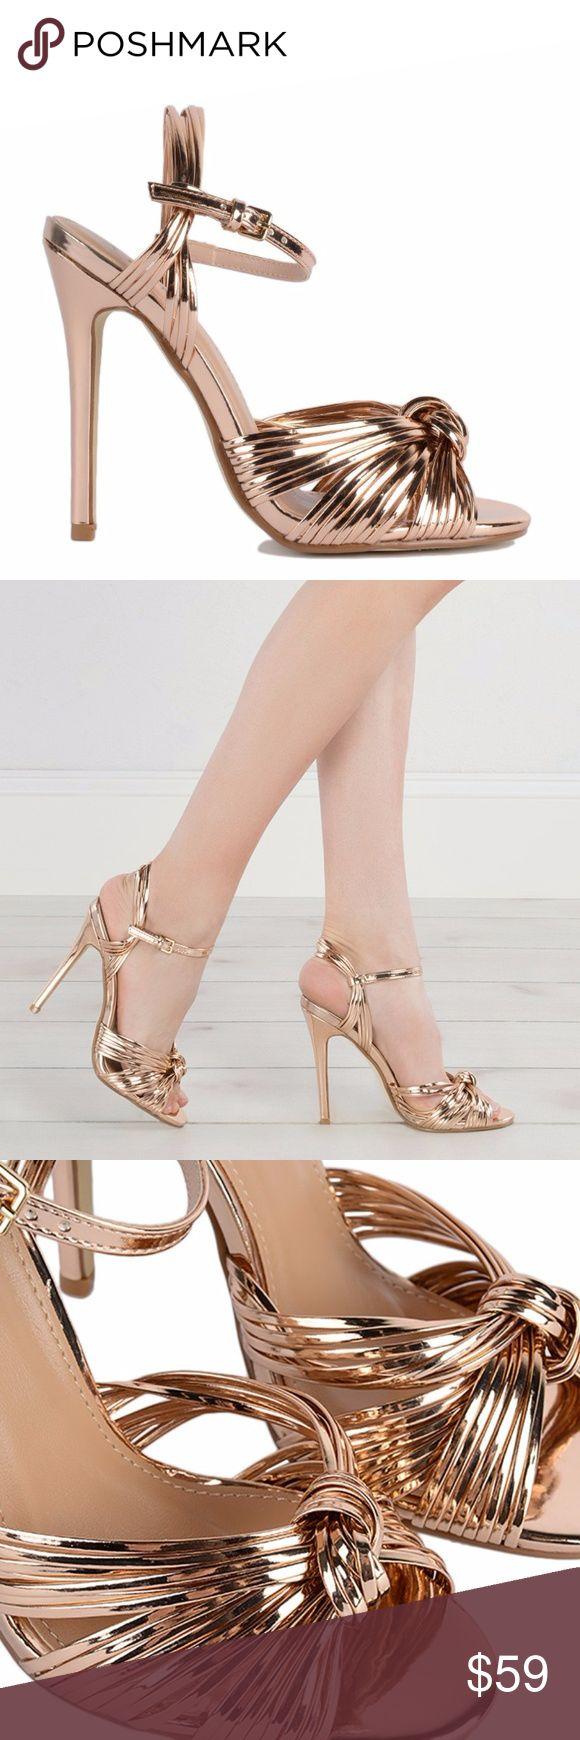 BNIB Strappy Stilleto Metallic Sandals Heels NIB Sexy Metallic Stilleto Heels in a rose/gold  pink champagne color. Shoes Heels